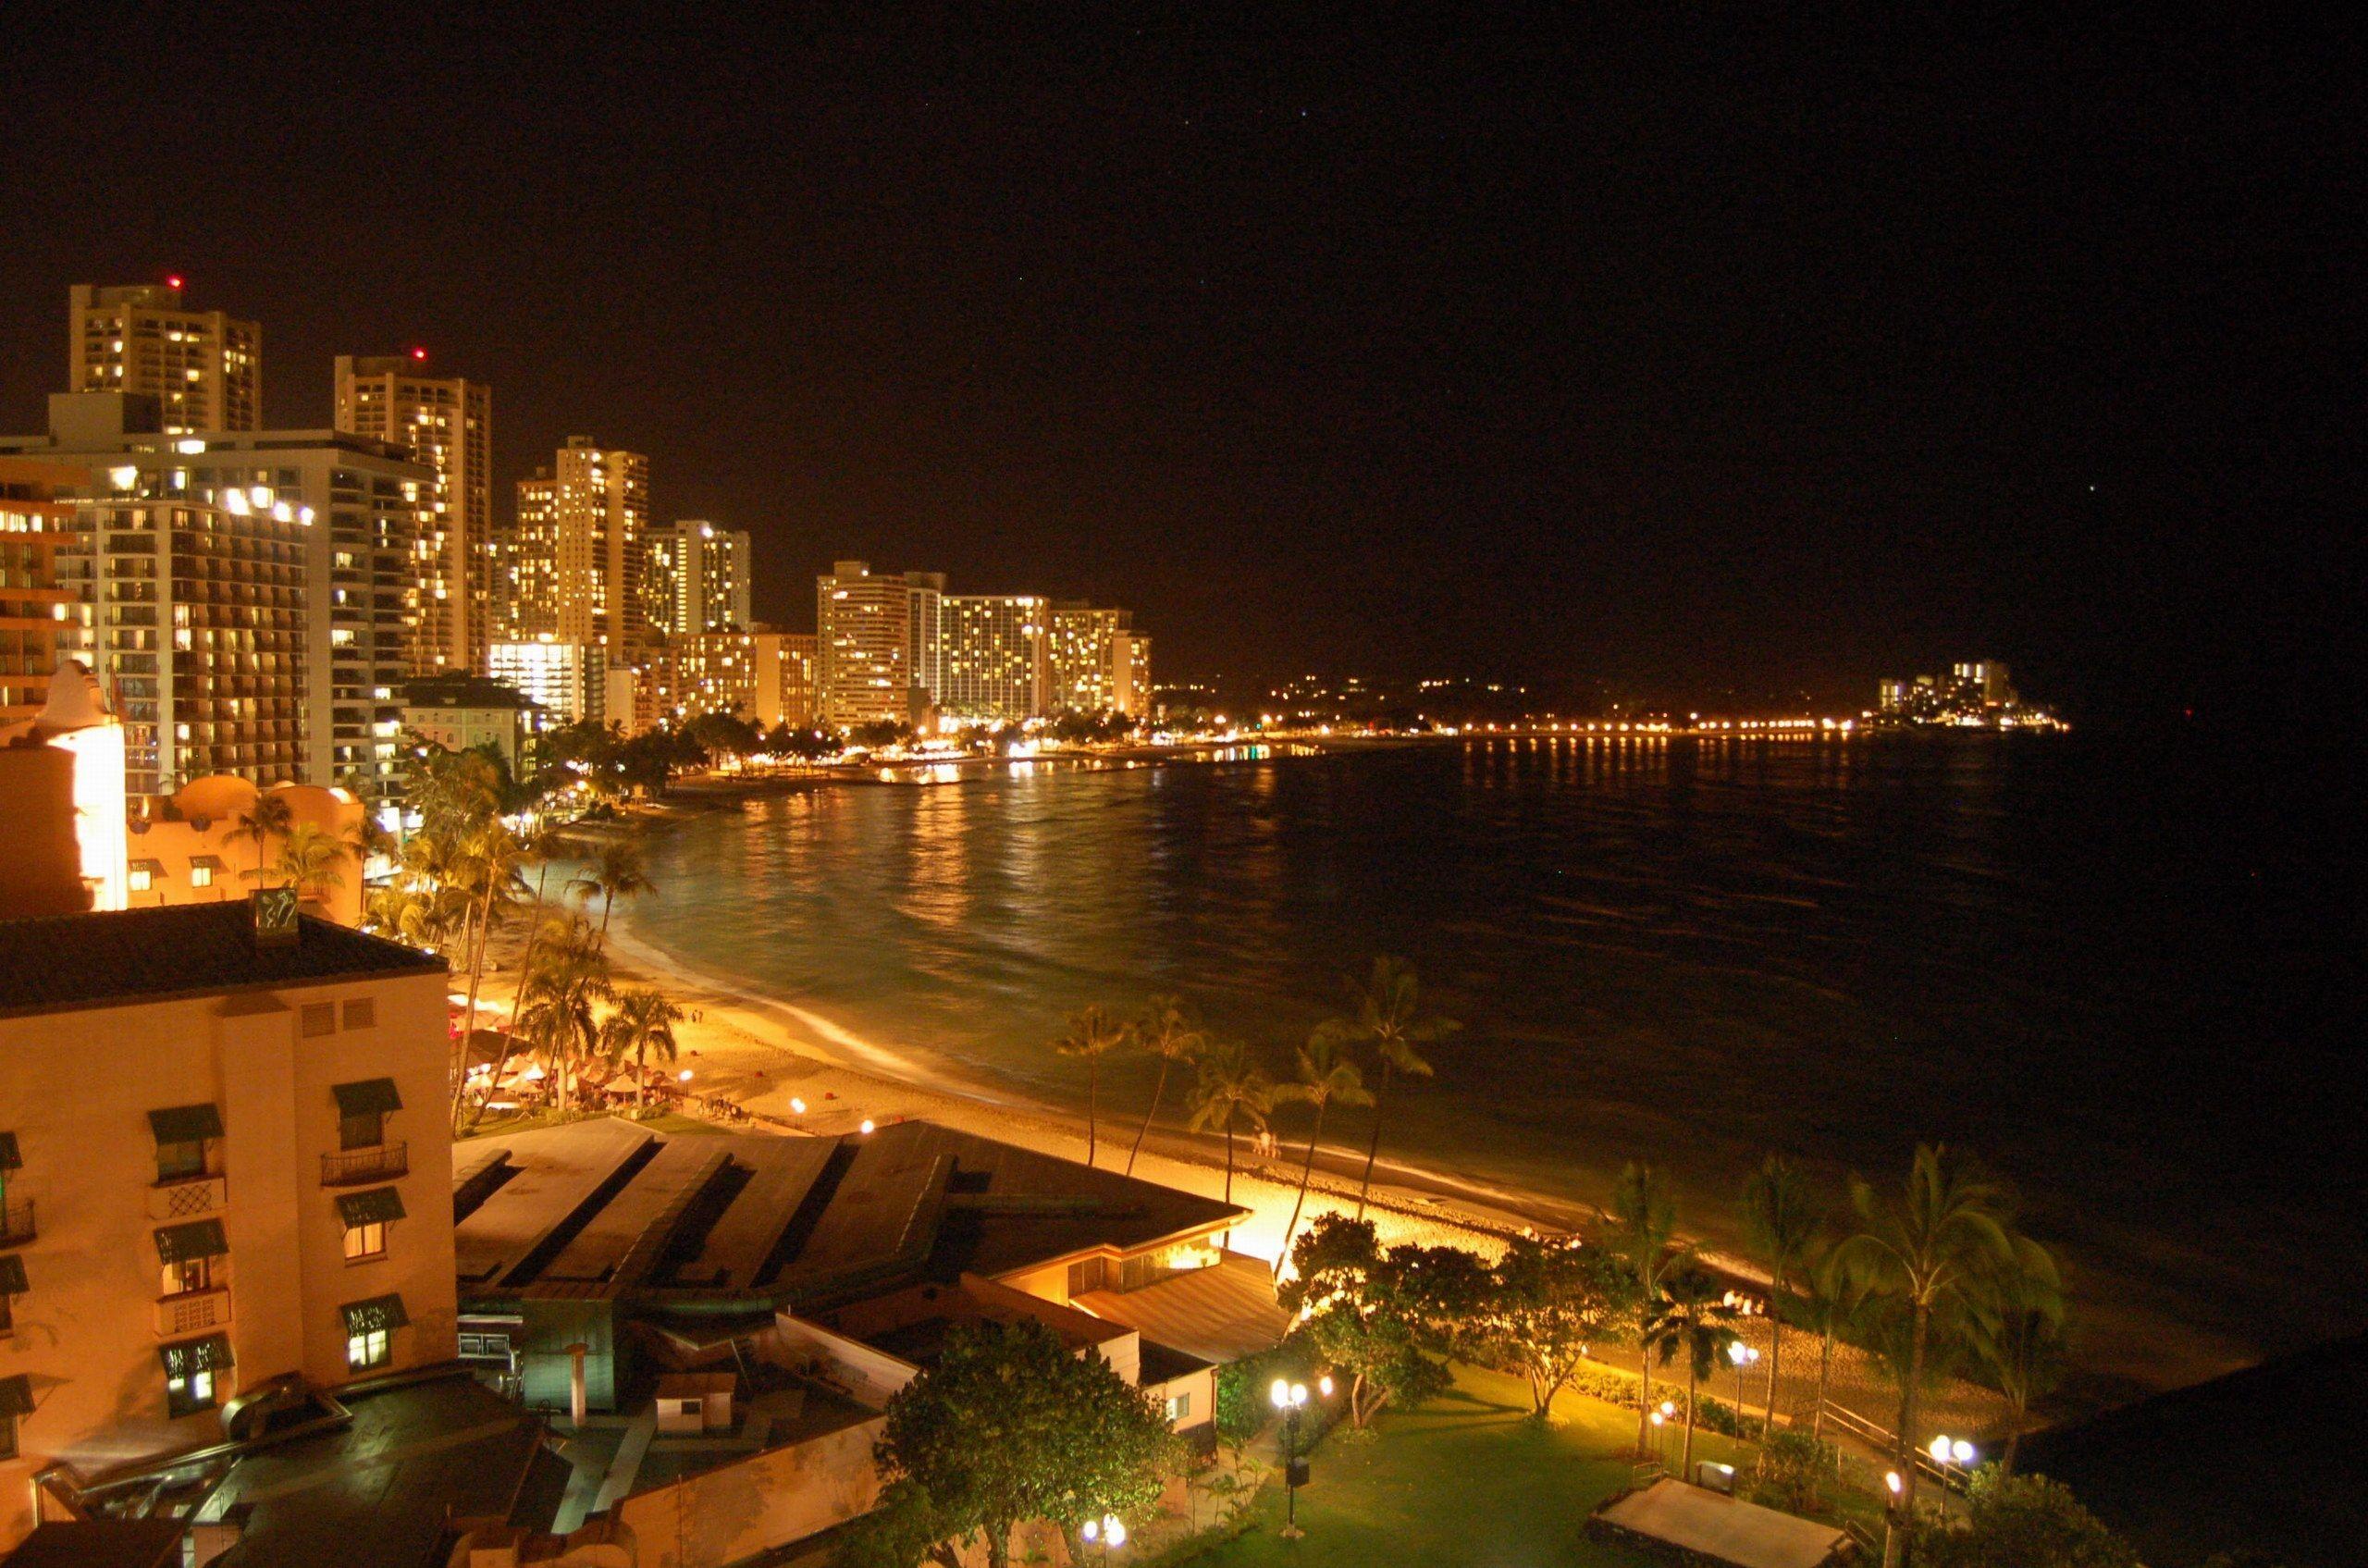 Res: 2560x1695, Waikiki Beach at night, Honolulu, Hawaii, USA Desktop Wallpapers and .